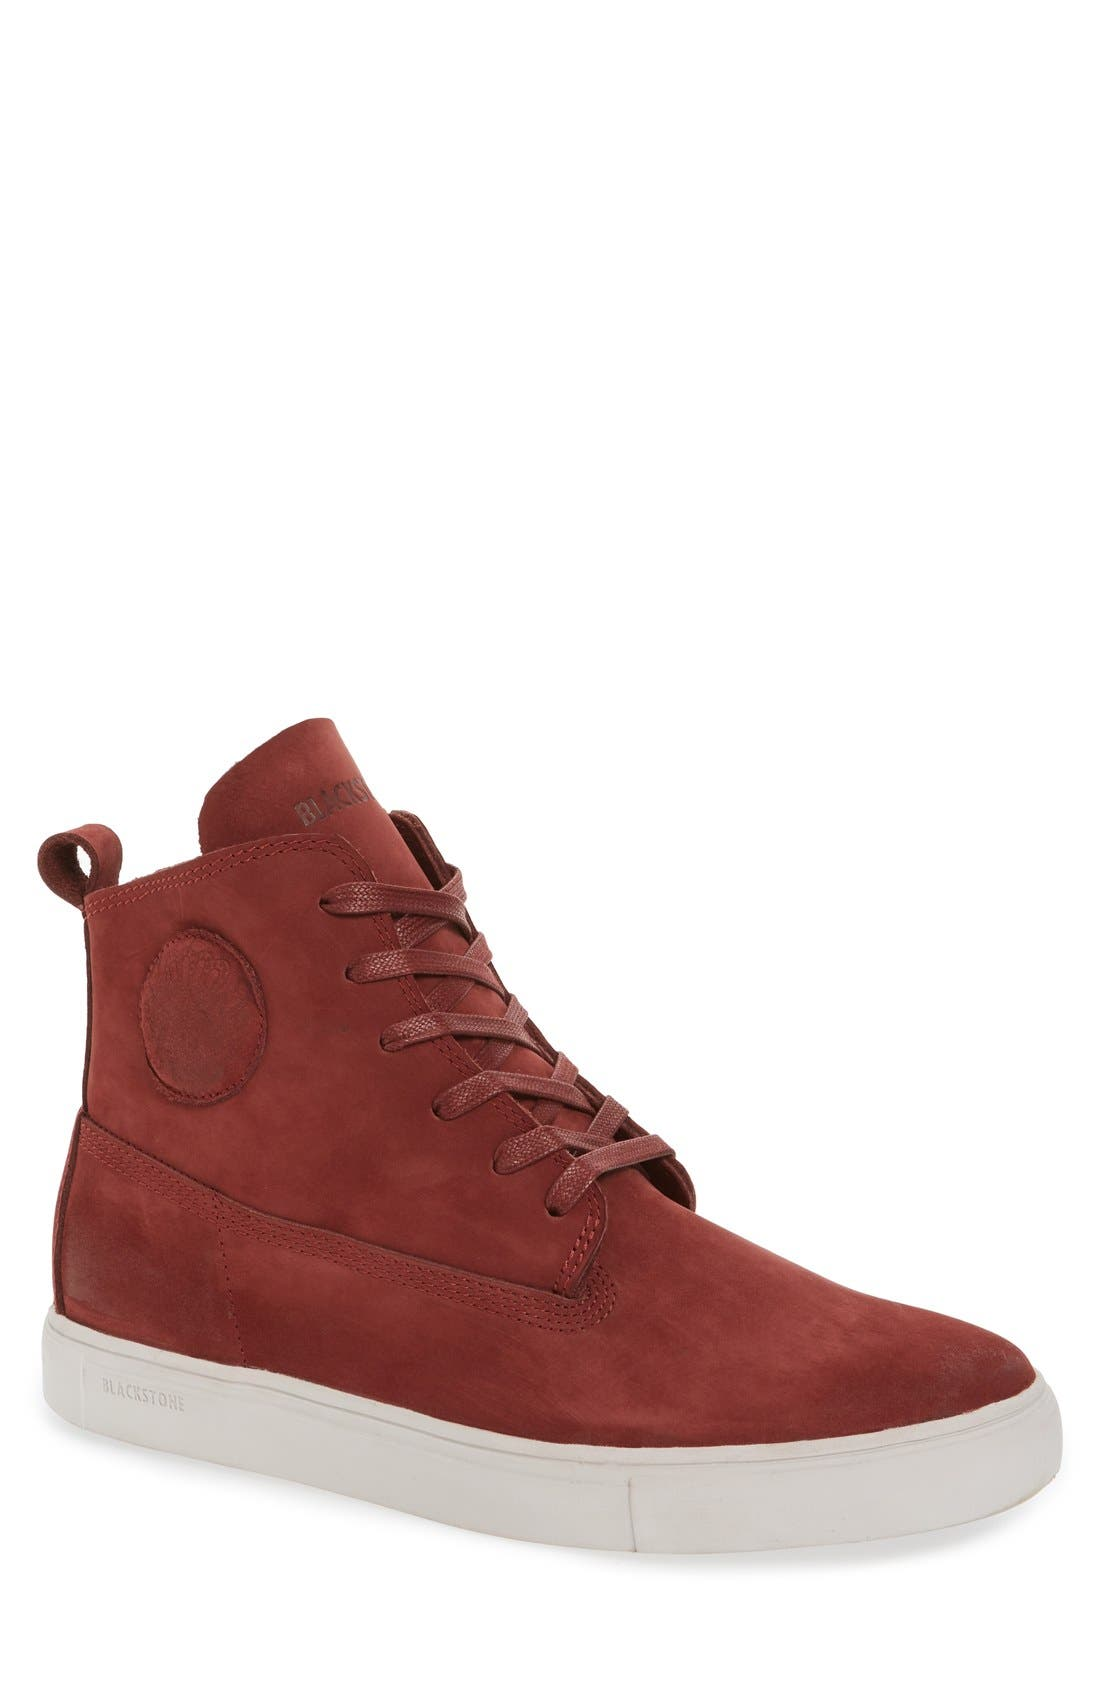 'MM33' High Top Sneaker,                         Main,                         color, Port